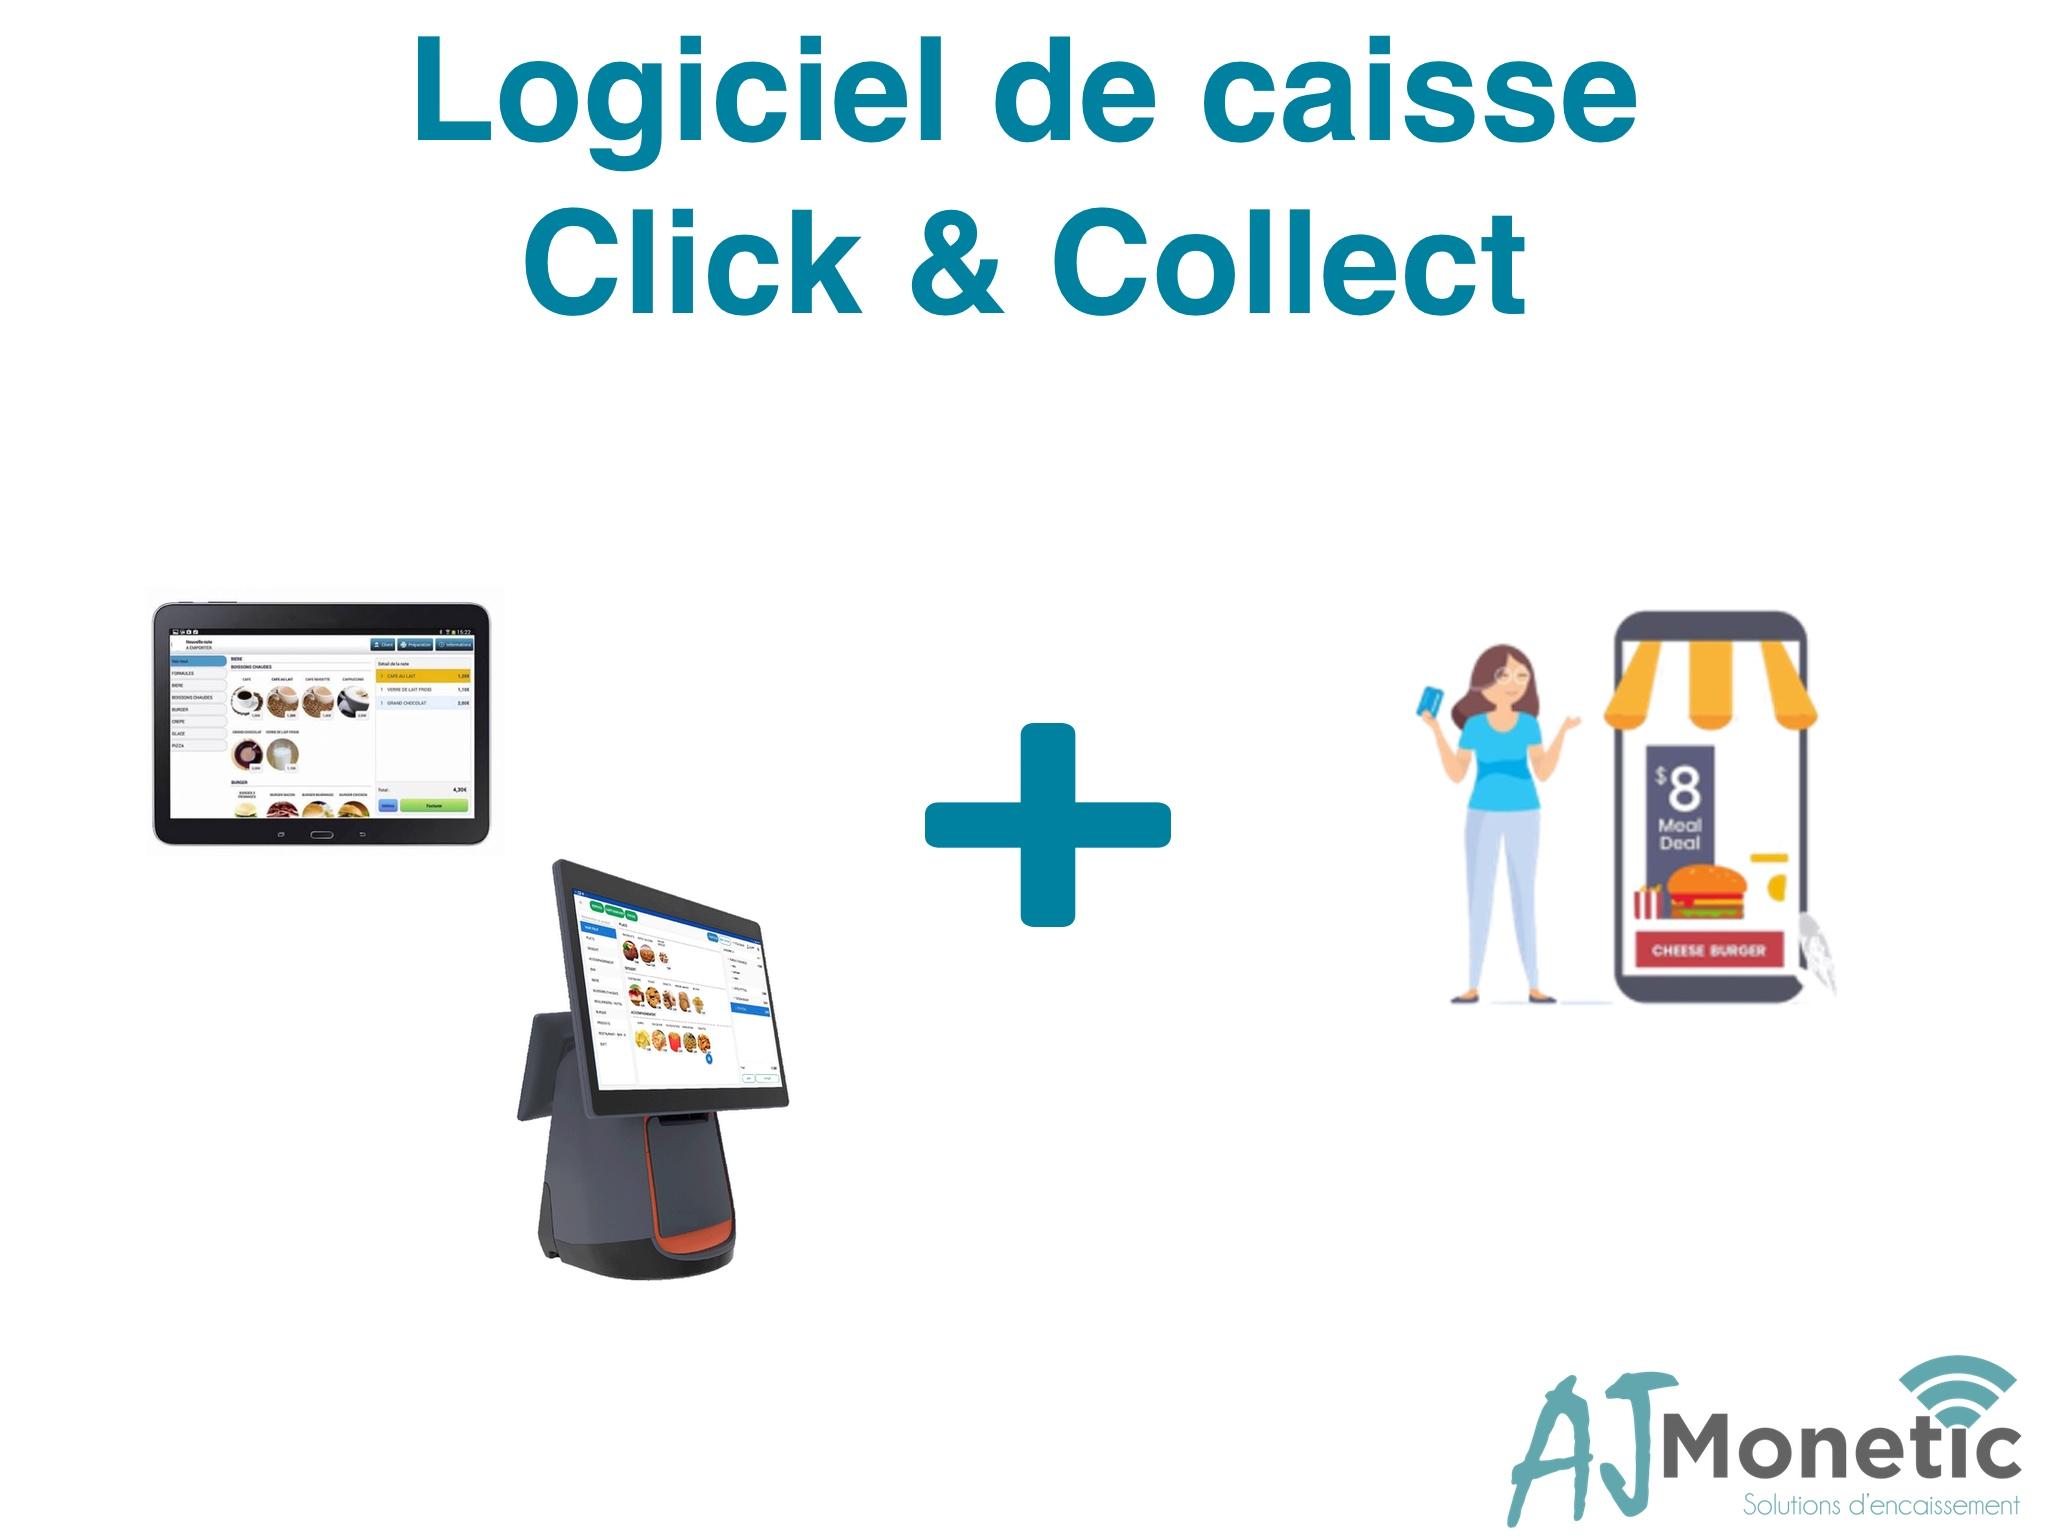 AJ MONETIC 13 - caisse click & collect